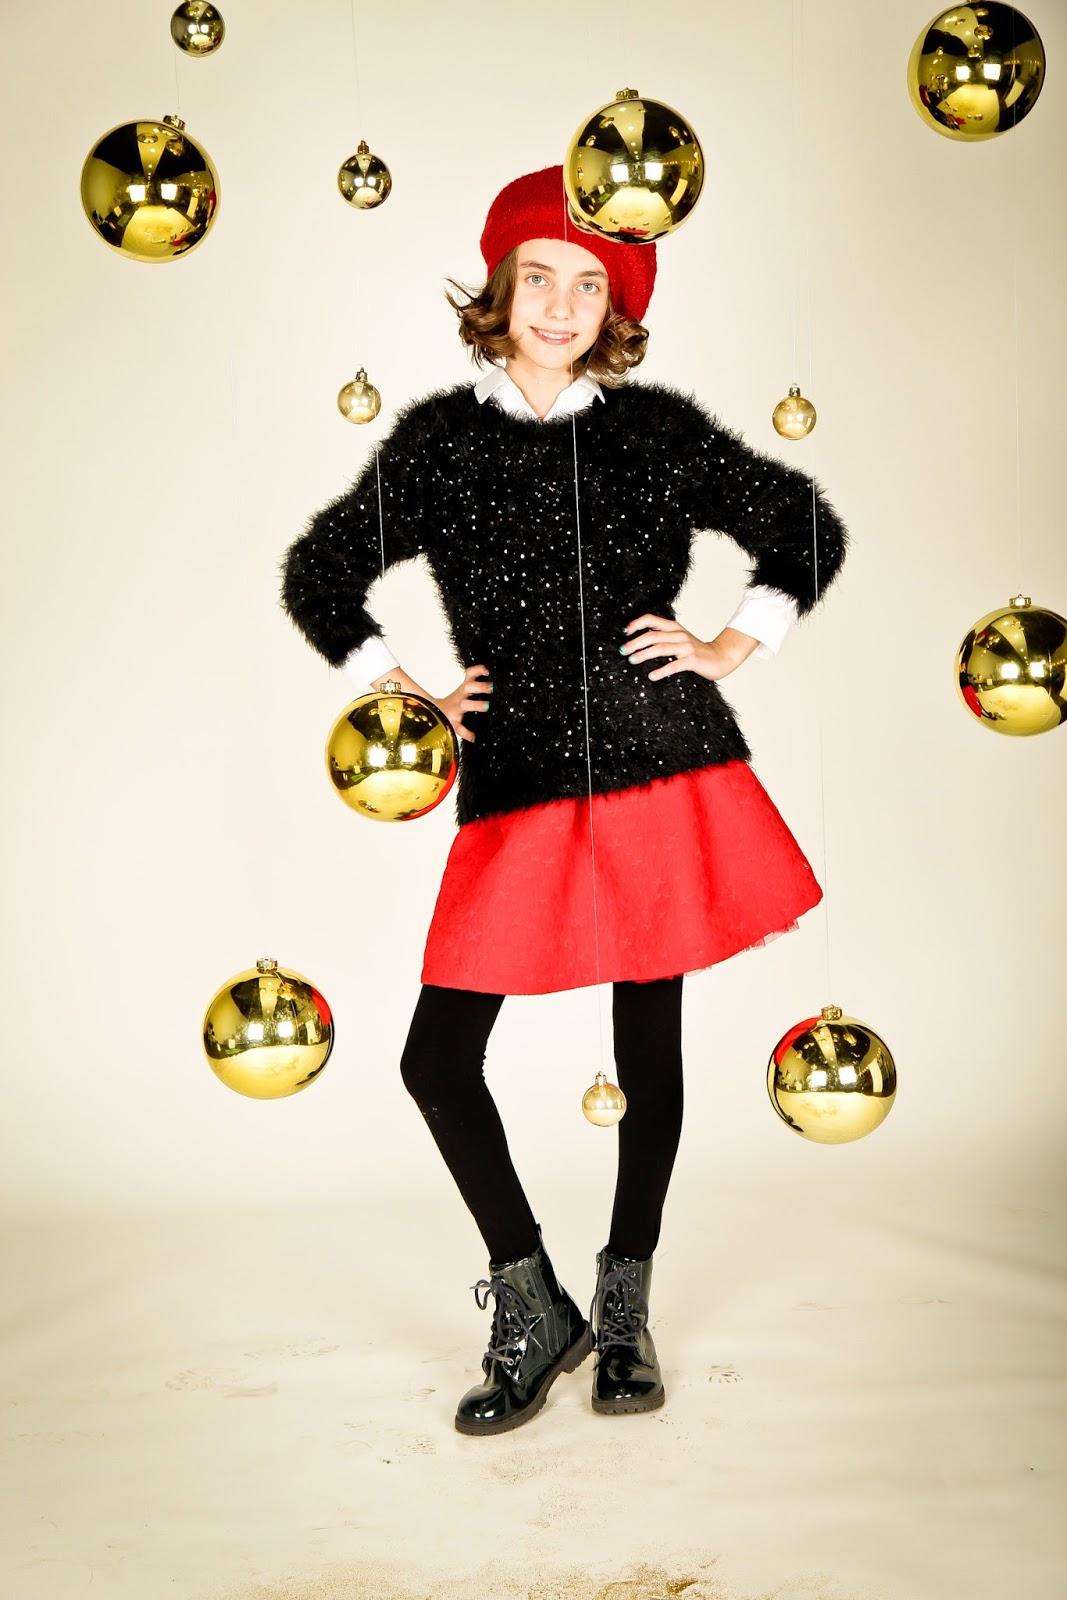 conjunto navideño, moda navidad